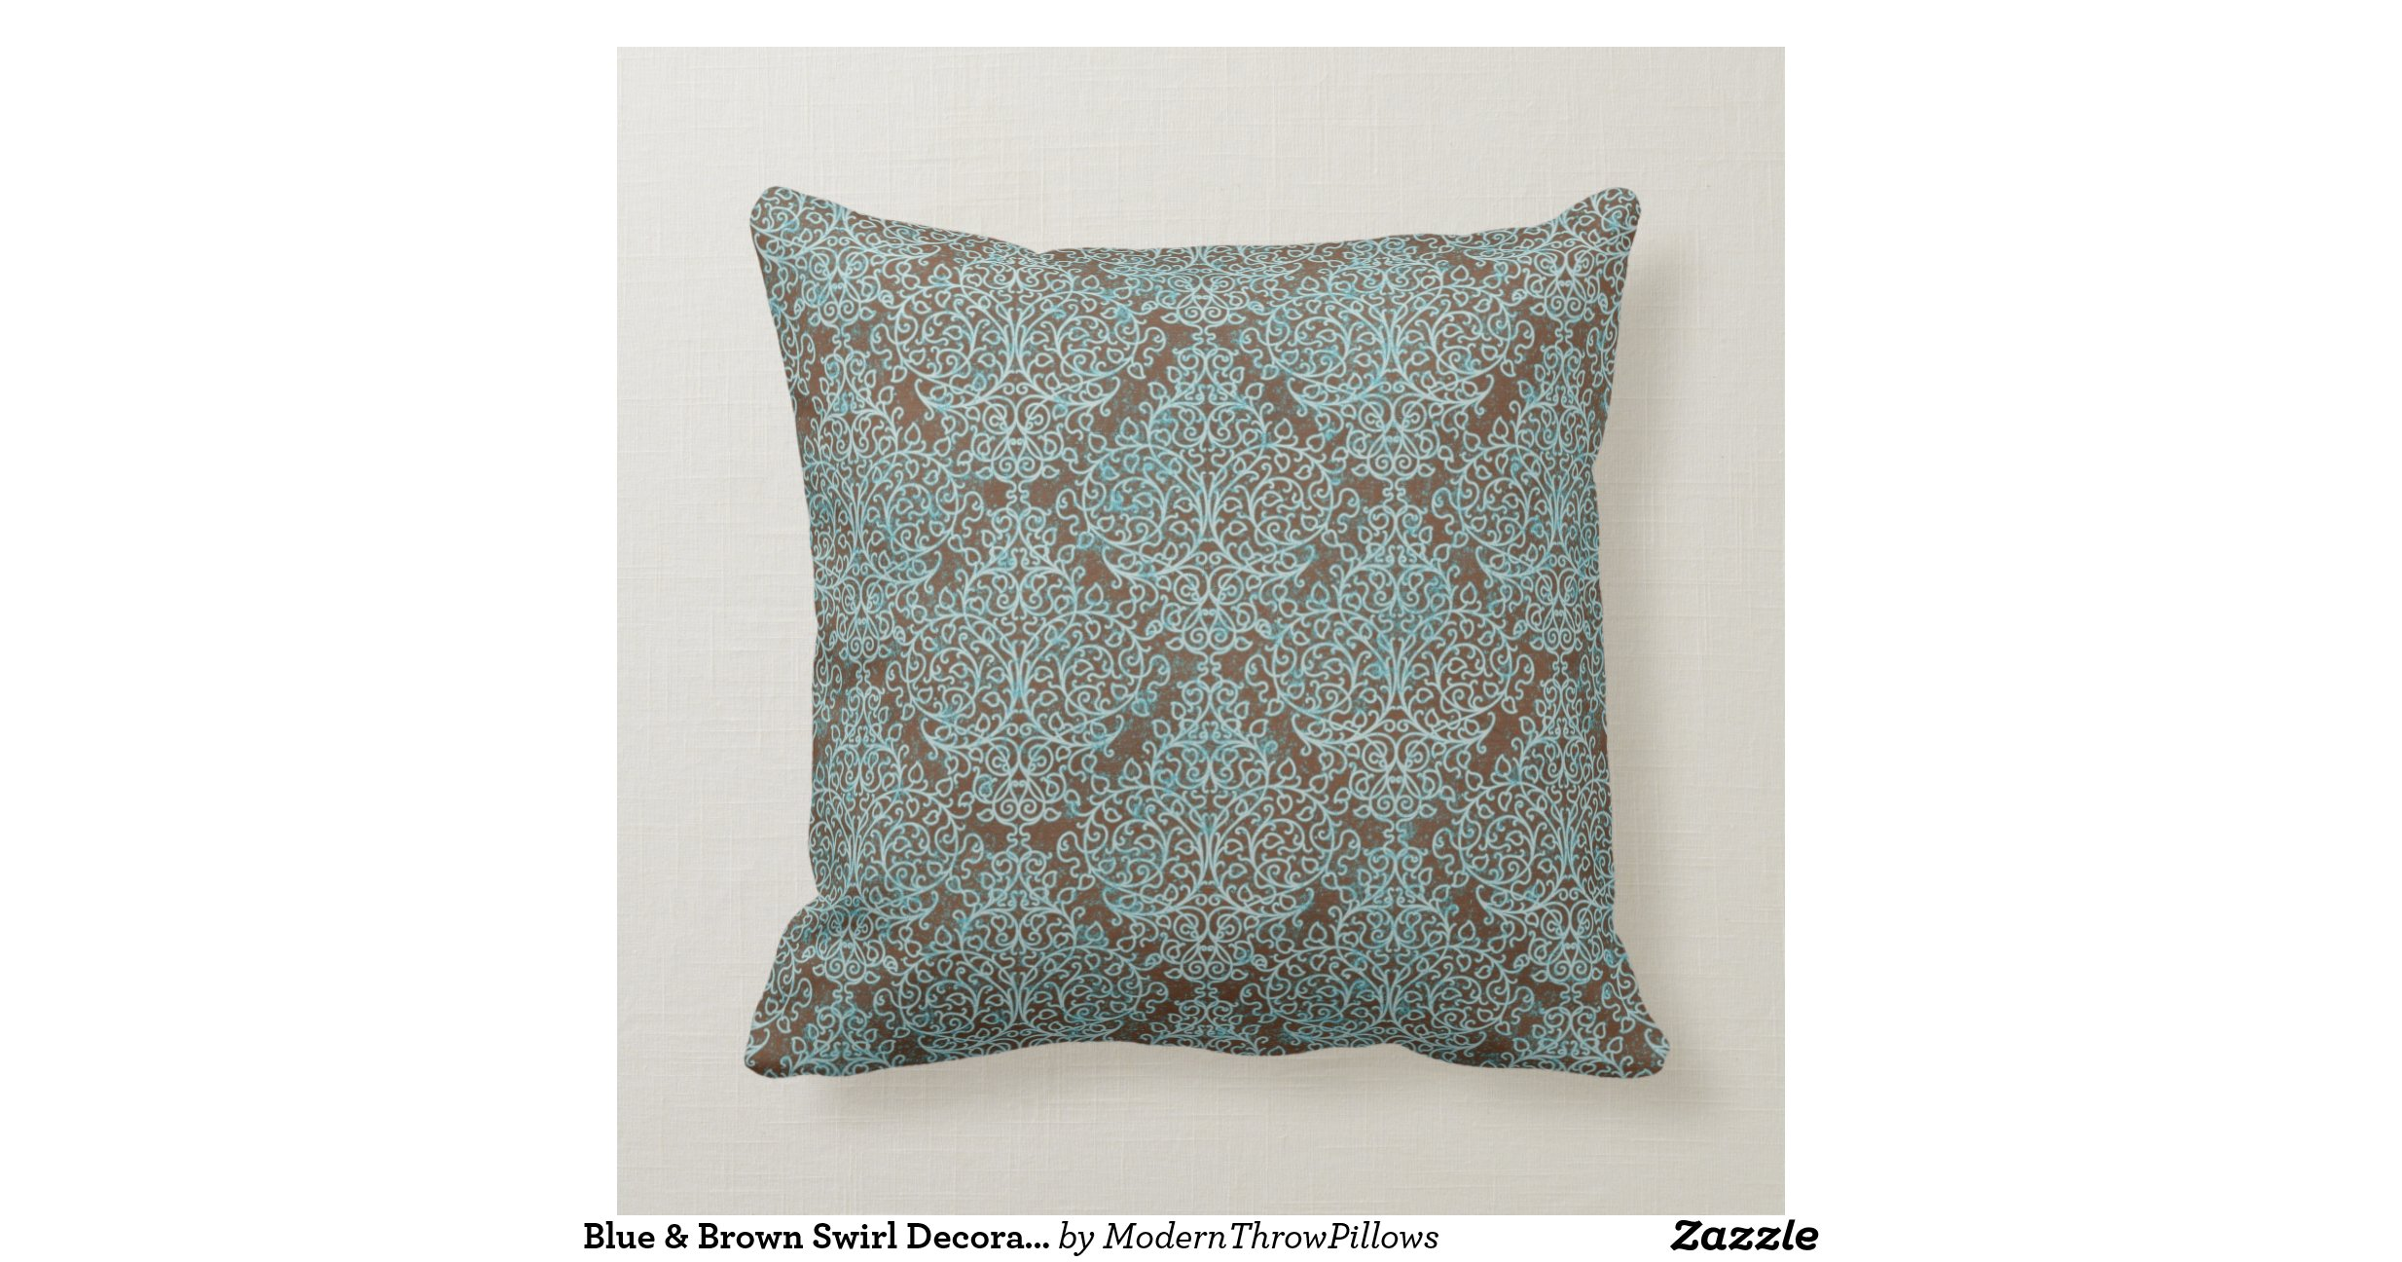 Blue & Brown Swirl Decorative Throw Pillow Throw Cushions Zazzle